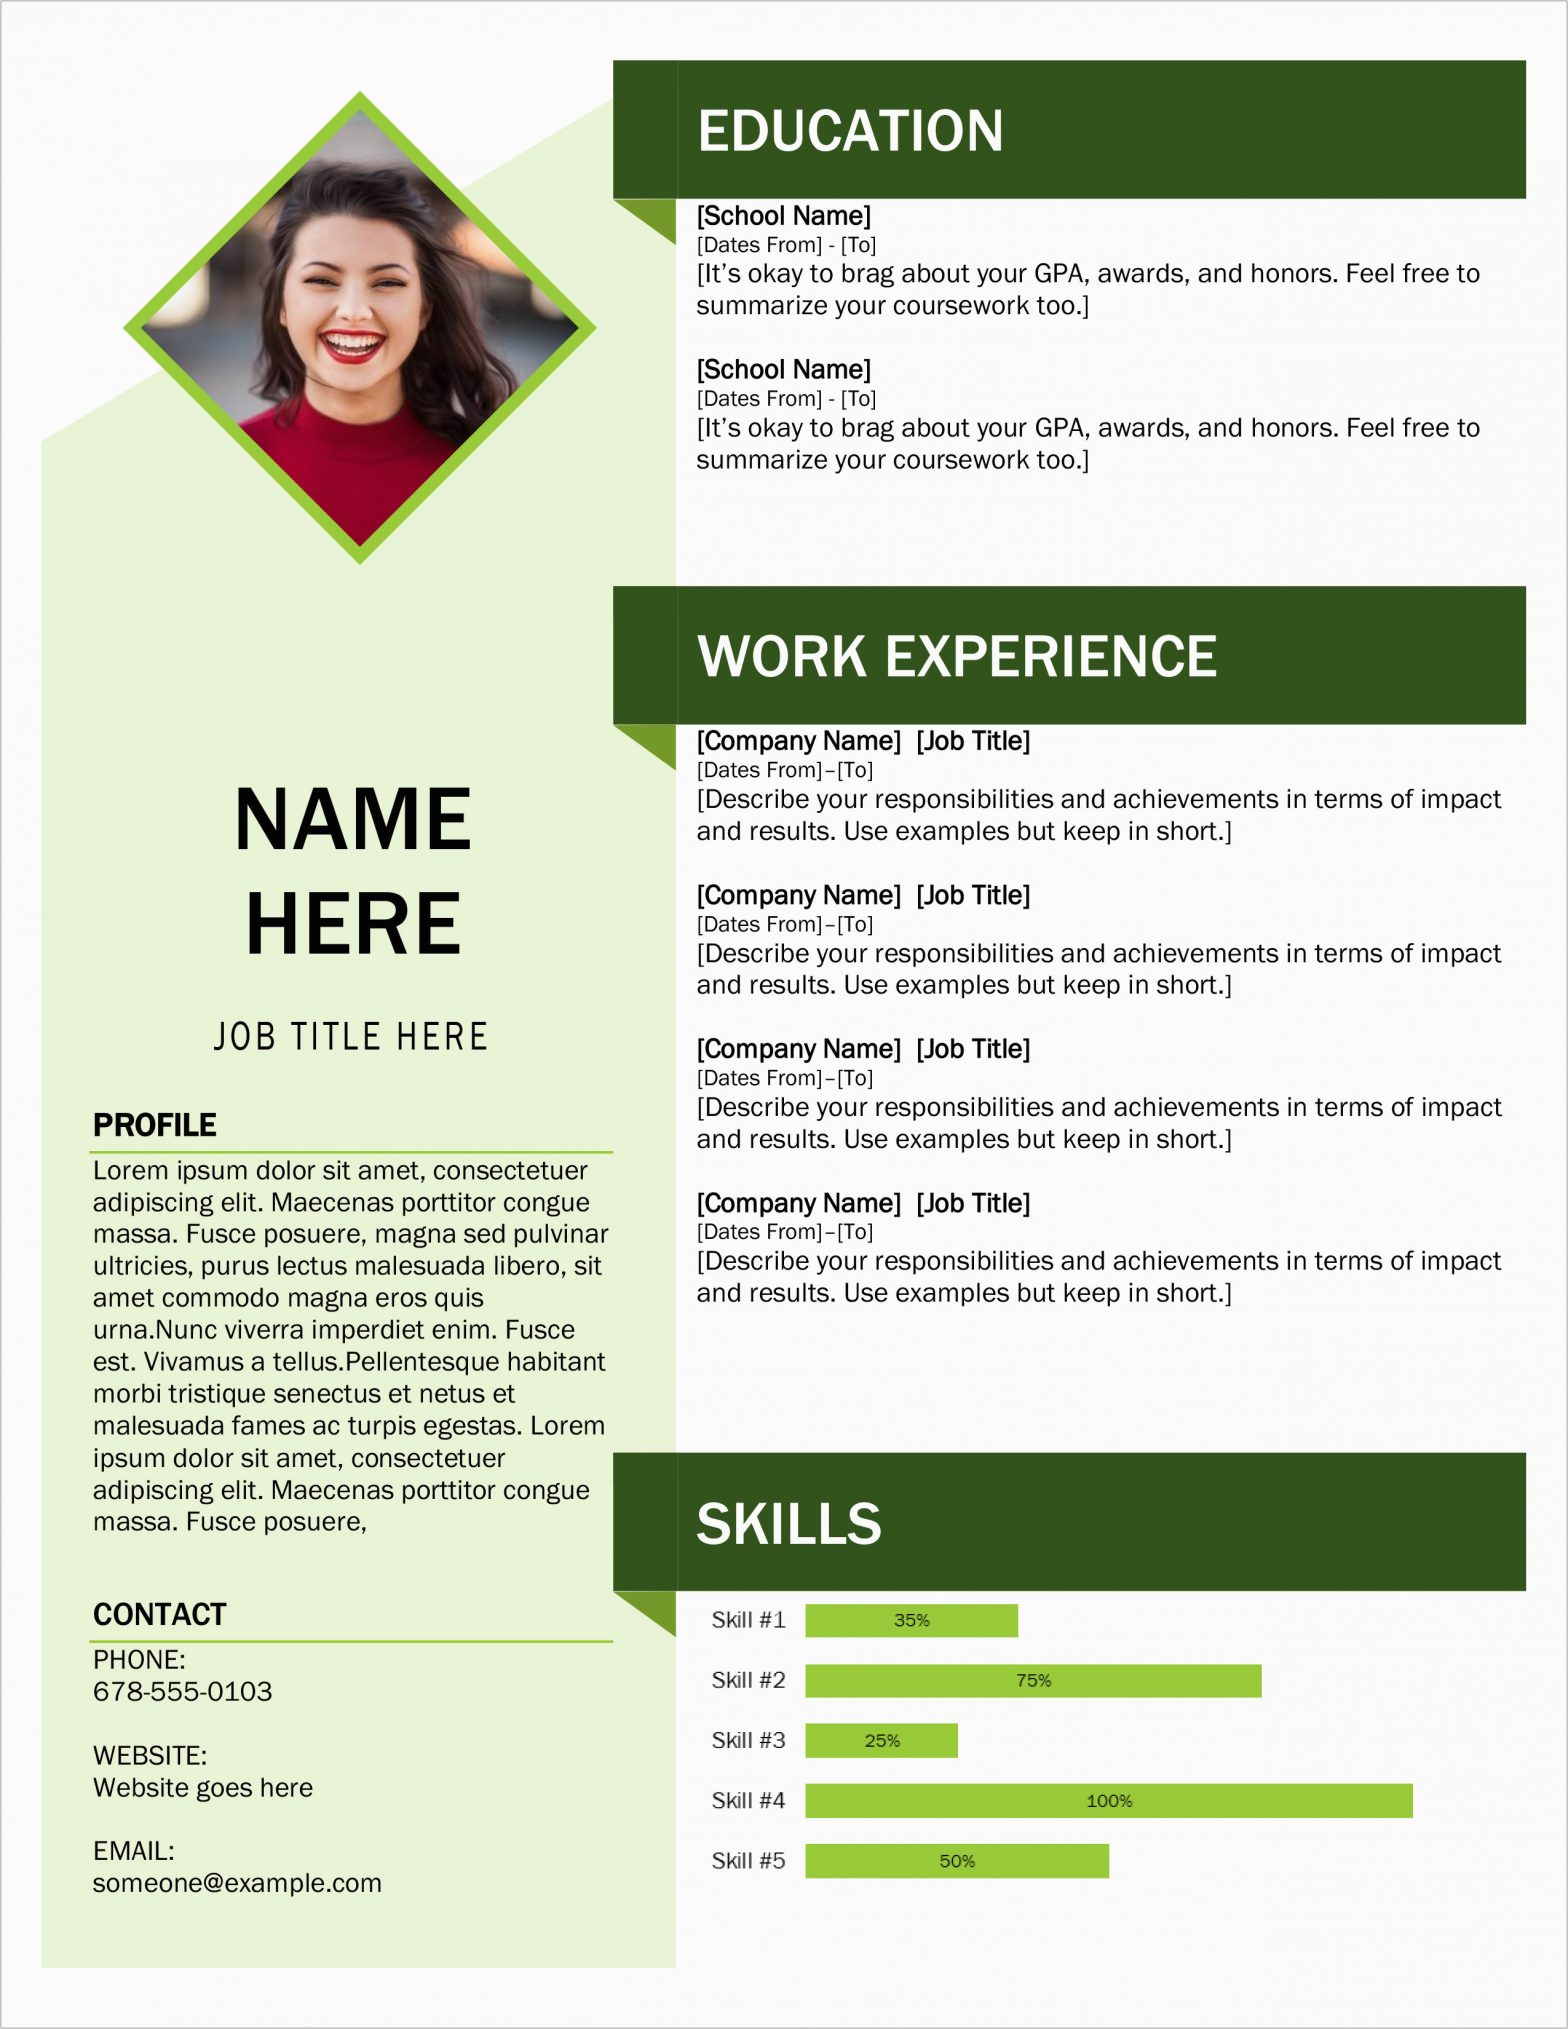 Download Free Microsoft Office Resume Sample Cv Template 45 Free Modern Resume Cv Templates Minimalist Simple